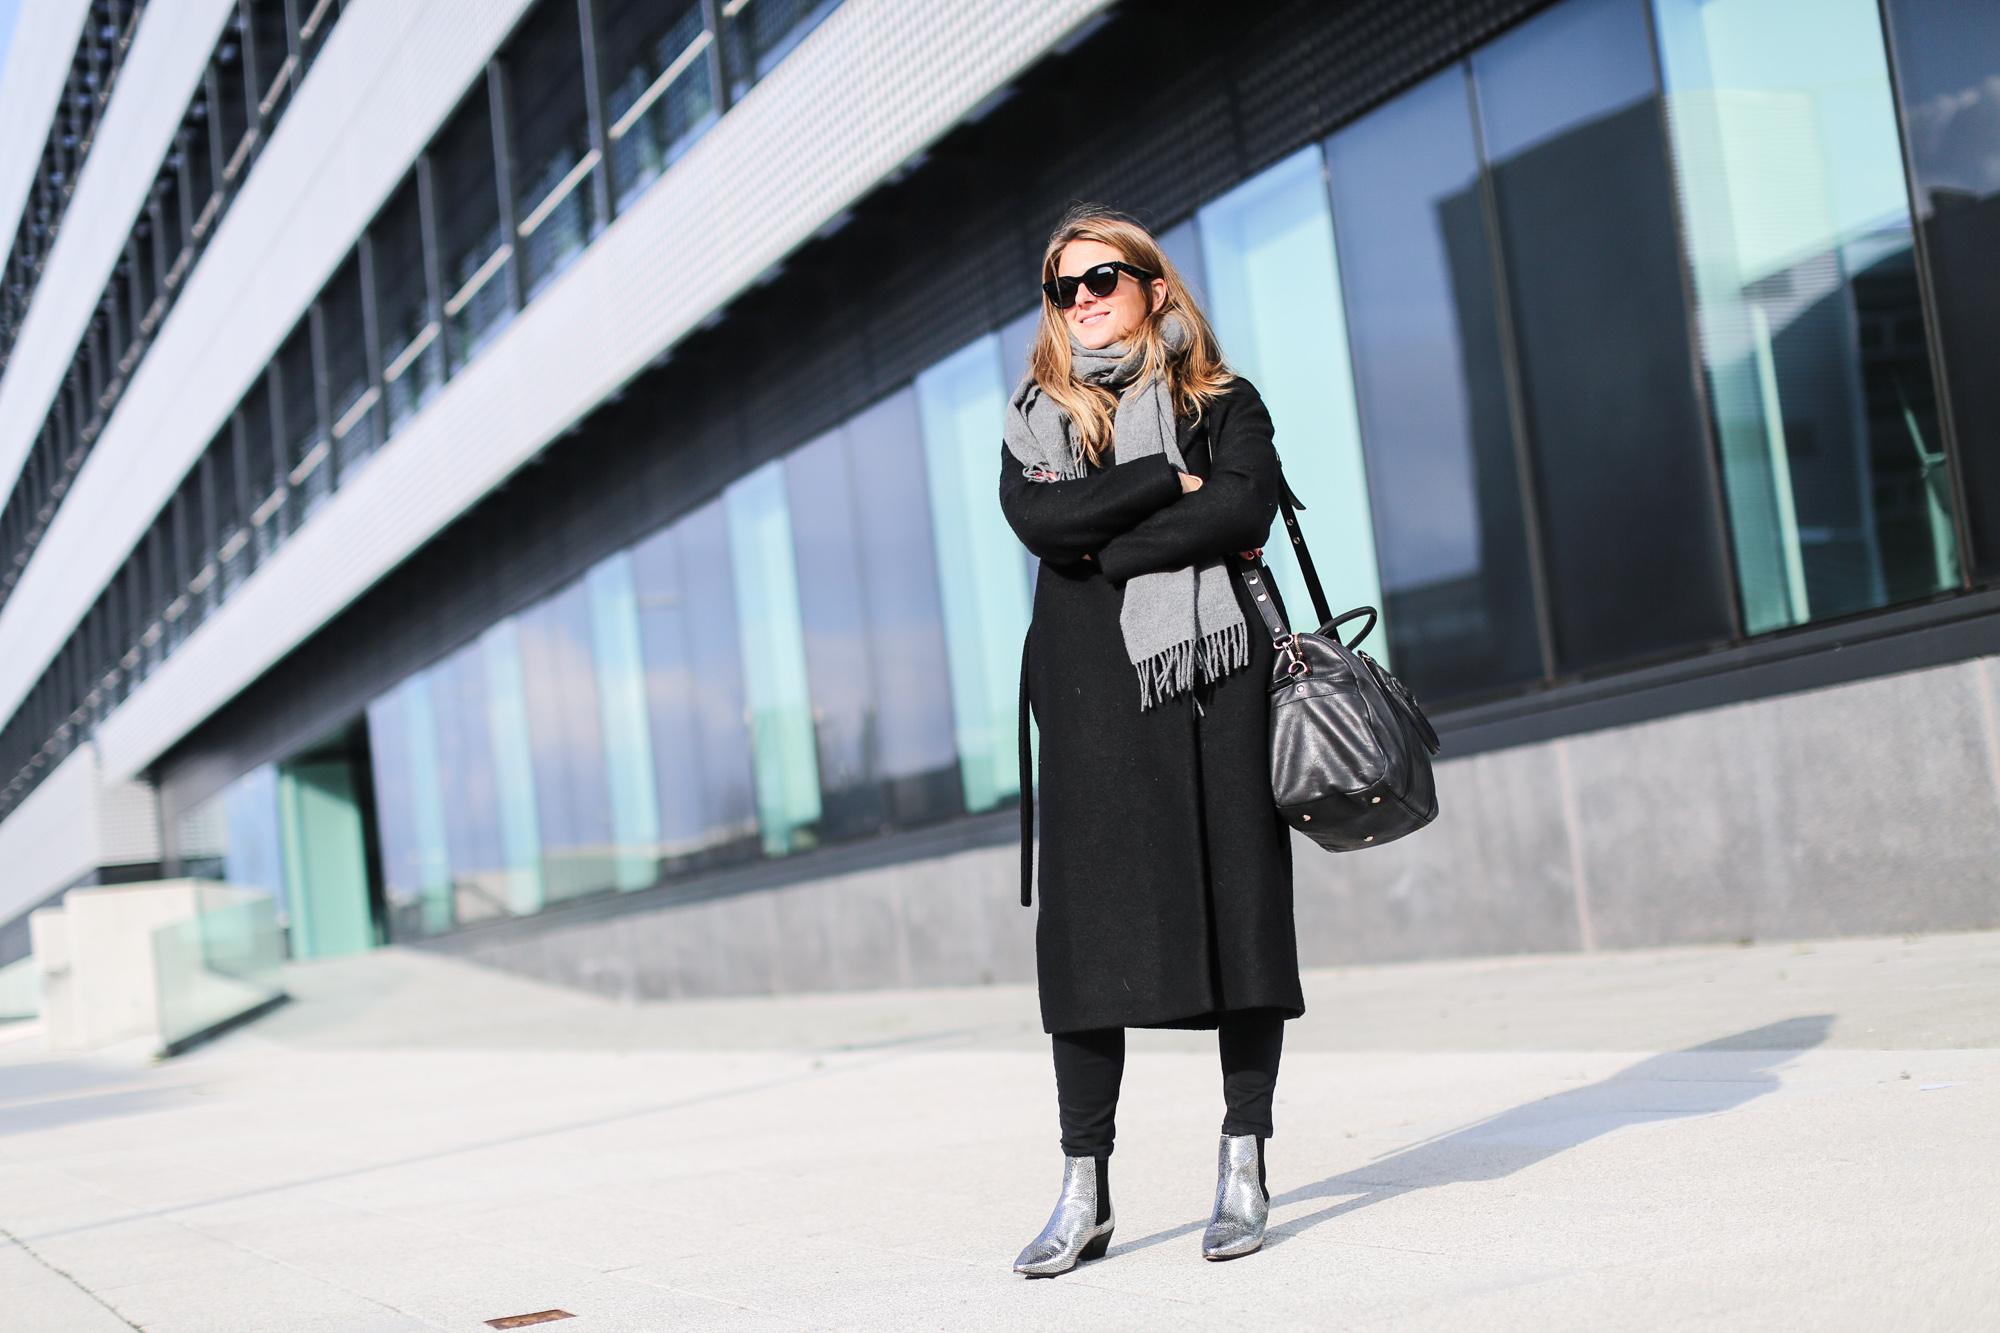 Clochet_streetstyle_fashionblogger_josefinabags_cosabrigolargolana_botinespielplateadosMaje_bufandaAcneStudiosCanada-2